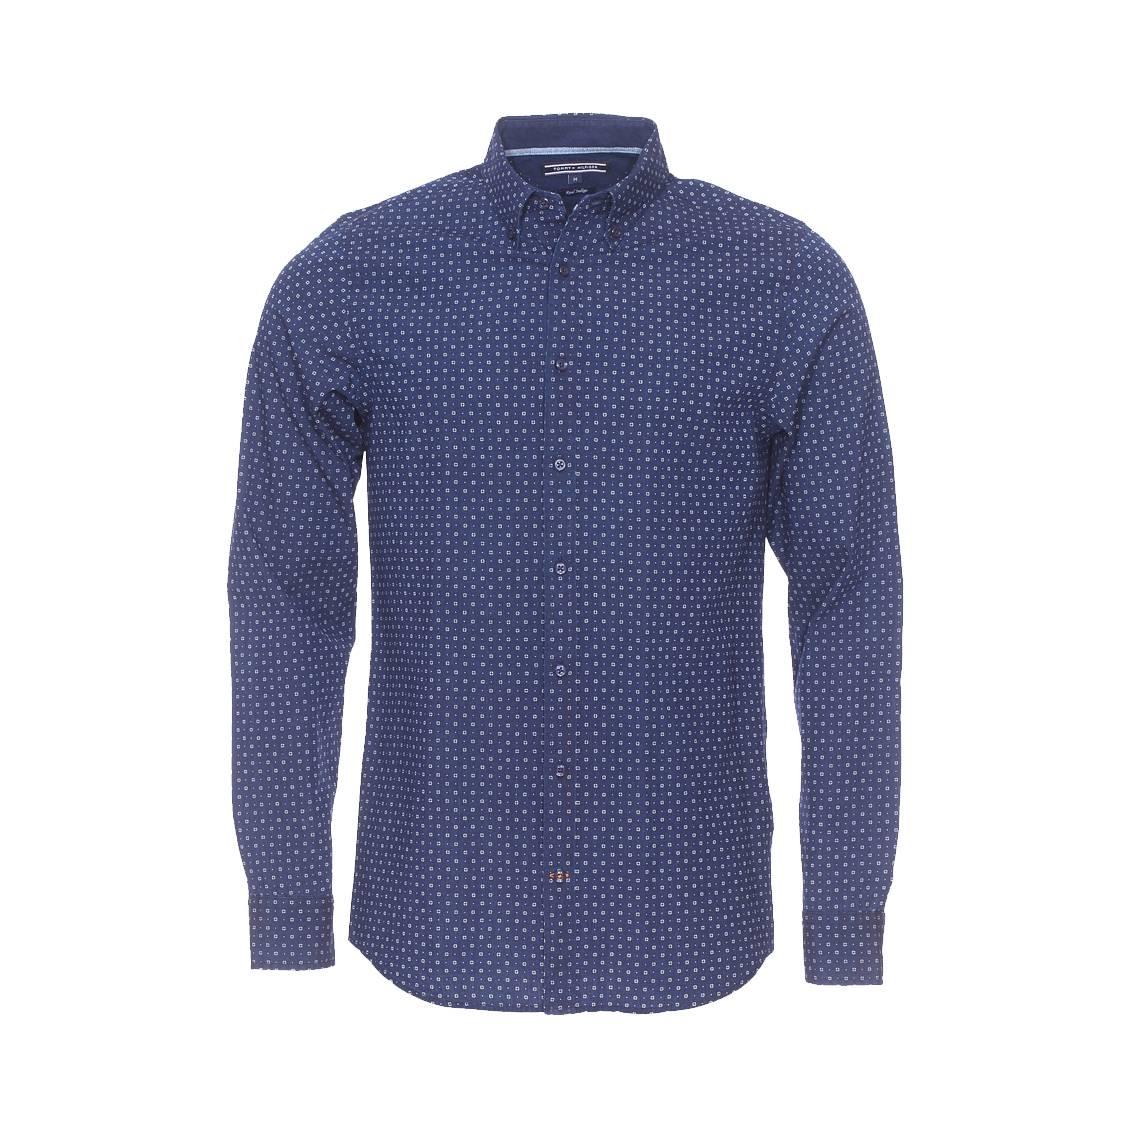 chemise ajust e tommy hilfiger en coton bleu marine petits motifs pois blancs rue des hommes. Black Bedroom Furniture Sets. Home Design Ideas